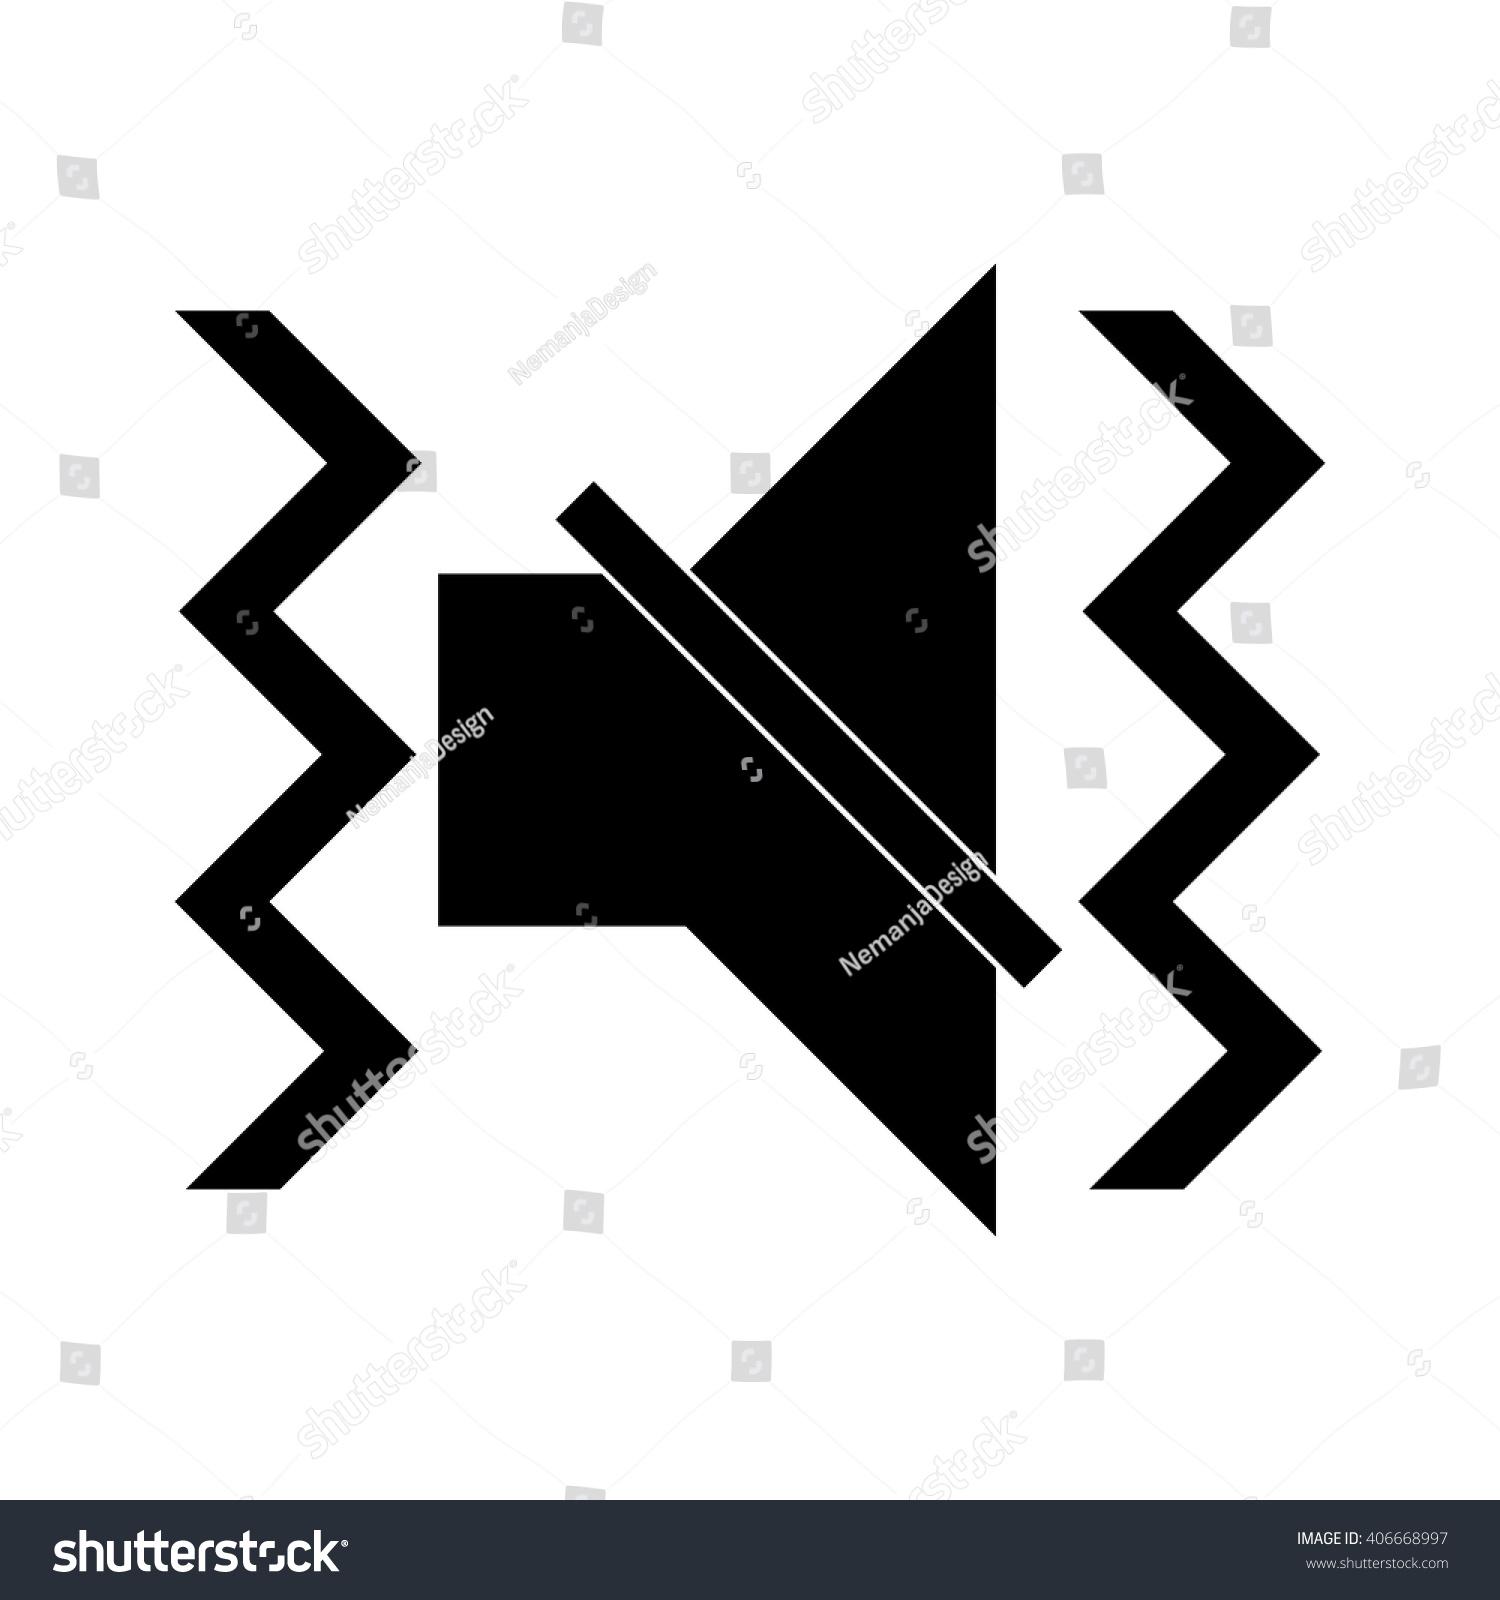 Vibration Icon Stock Vector 406668997 - Shutterstock